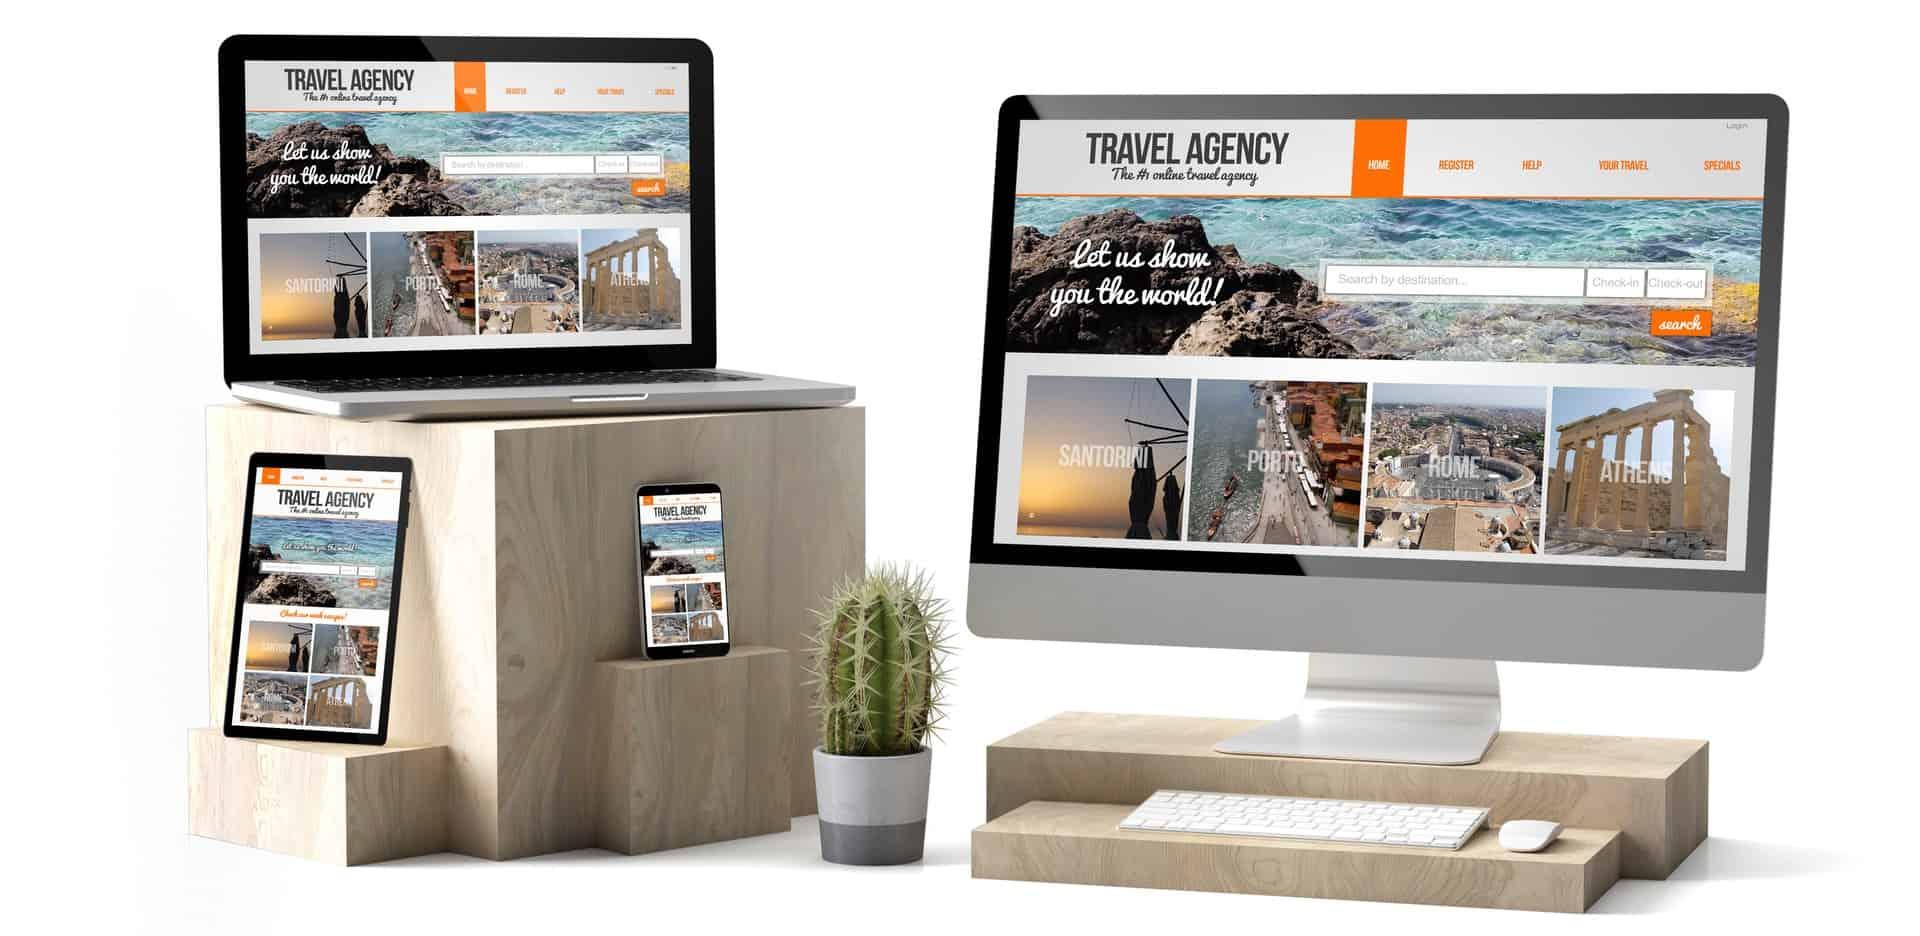 innoMEDIA Webdesign Lake Country